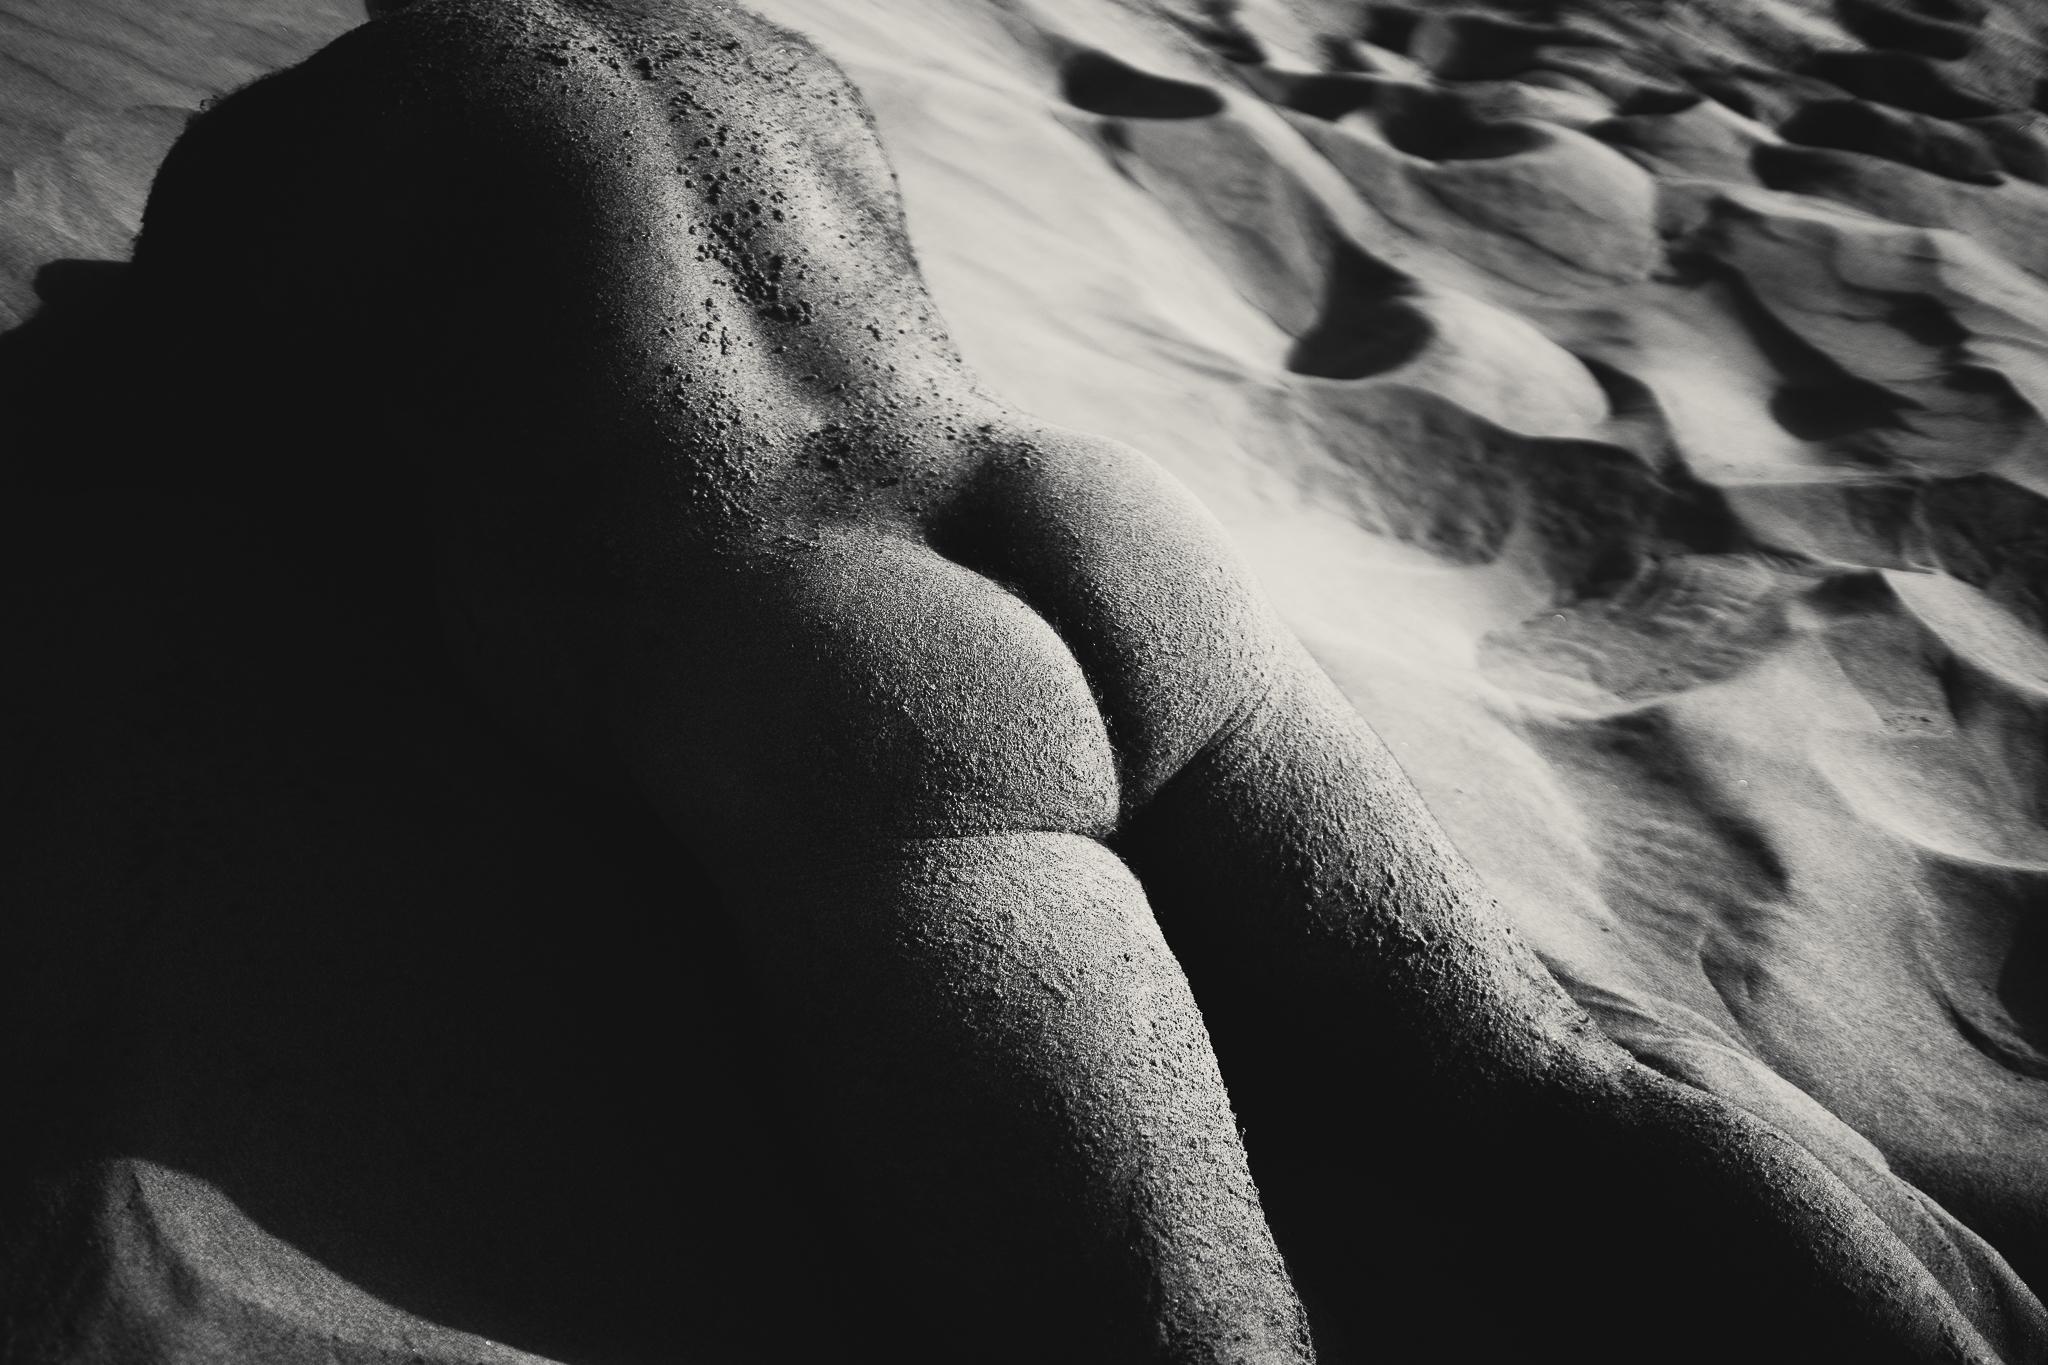 BeachGC-oliverzeukephotography-DSC0875018.jpg